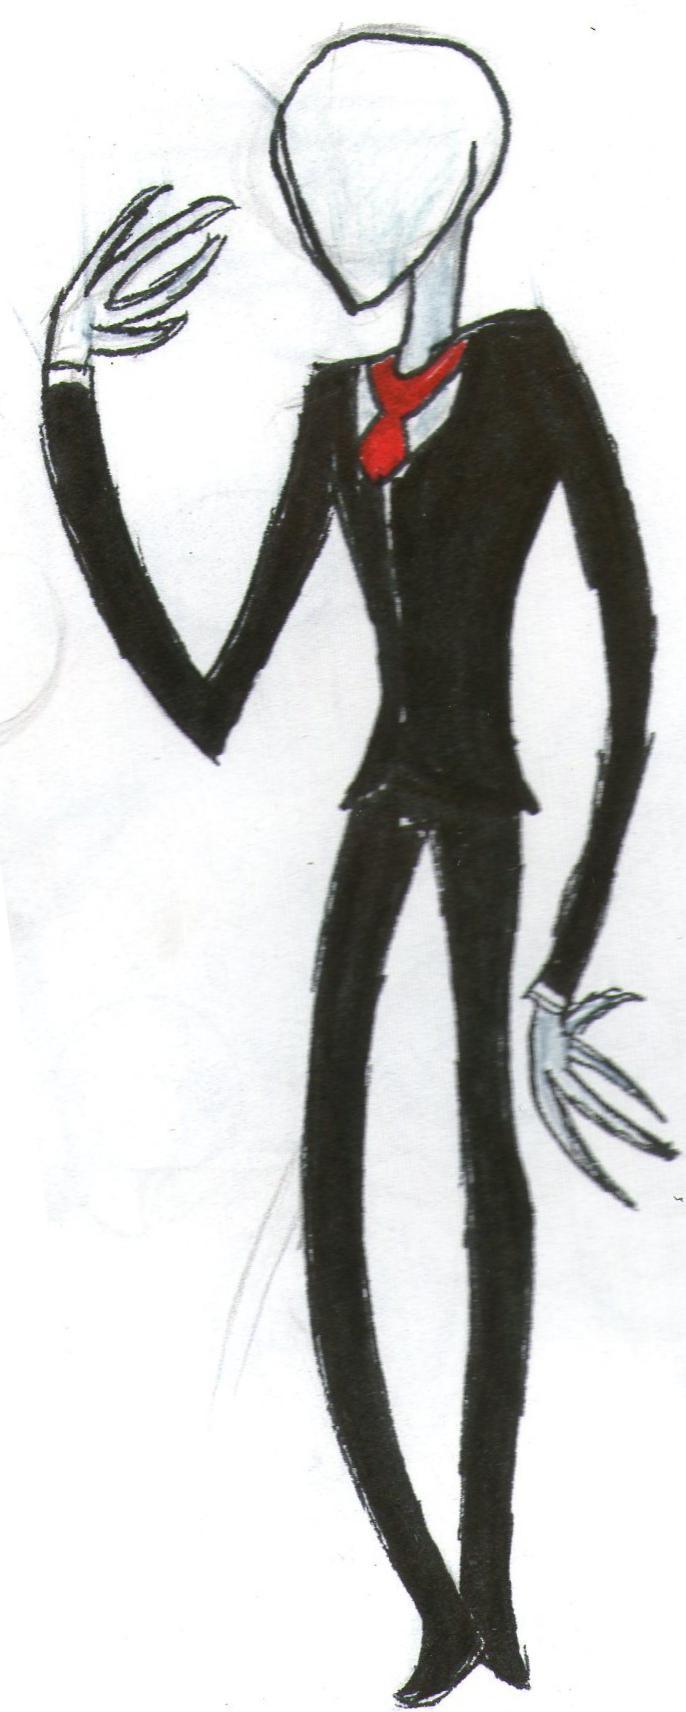 Slender man in color by mrs monsterchocolate on deviantart for Slender man coloring pages